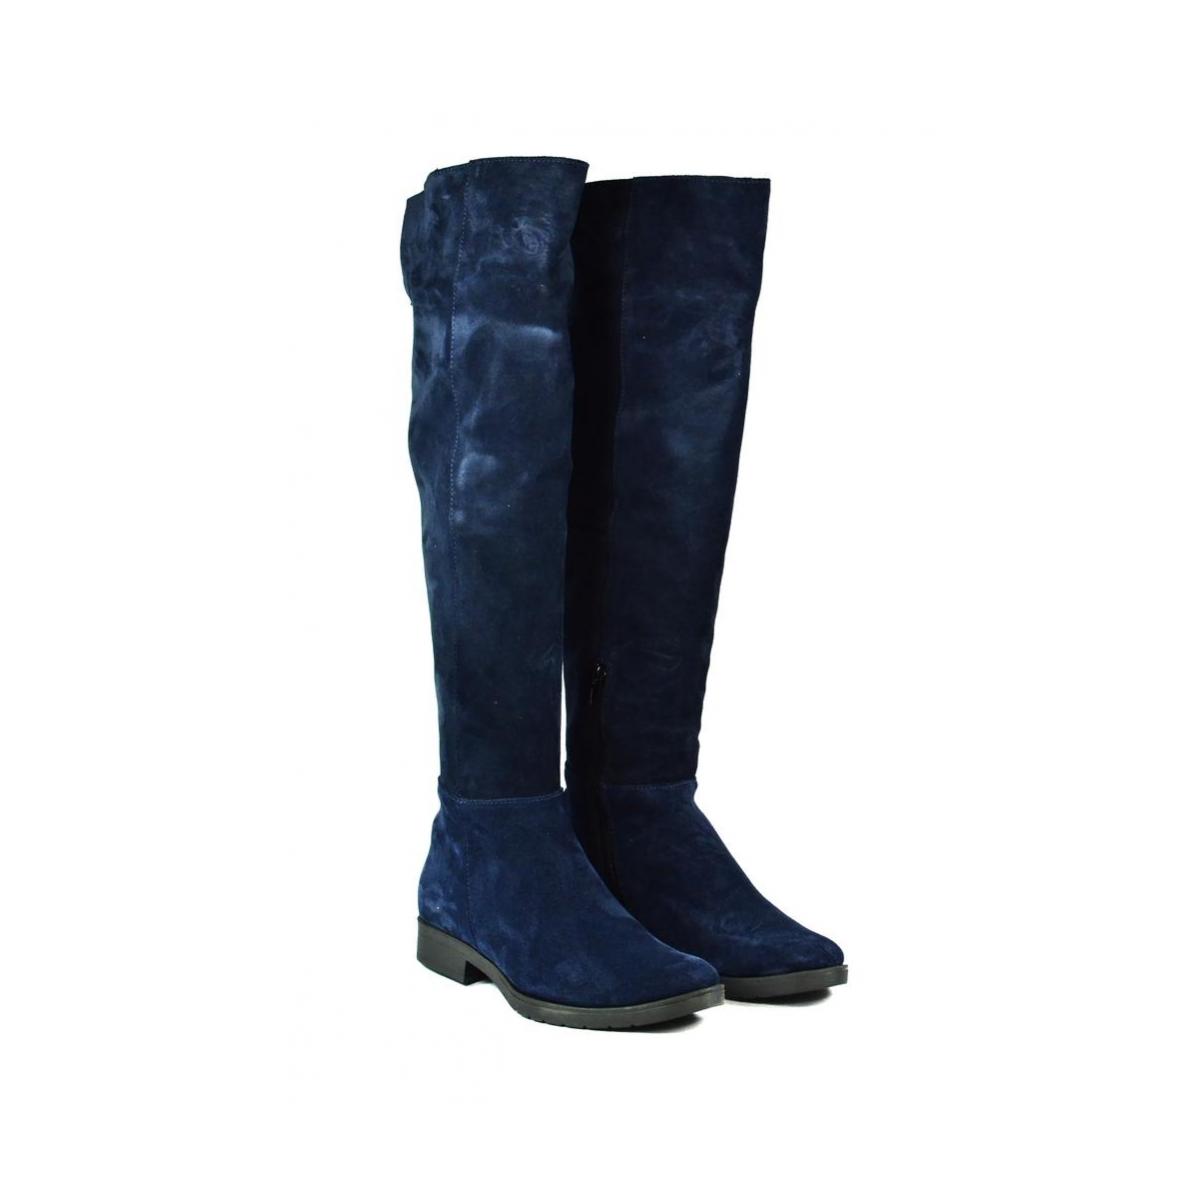 e0da48be9a70 Dámske modré čižmy ALIANA - 2